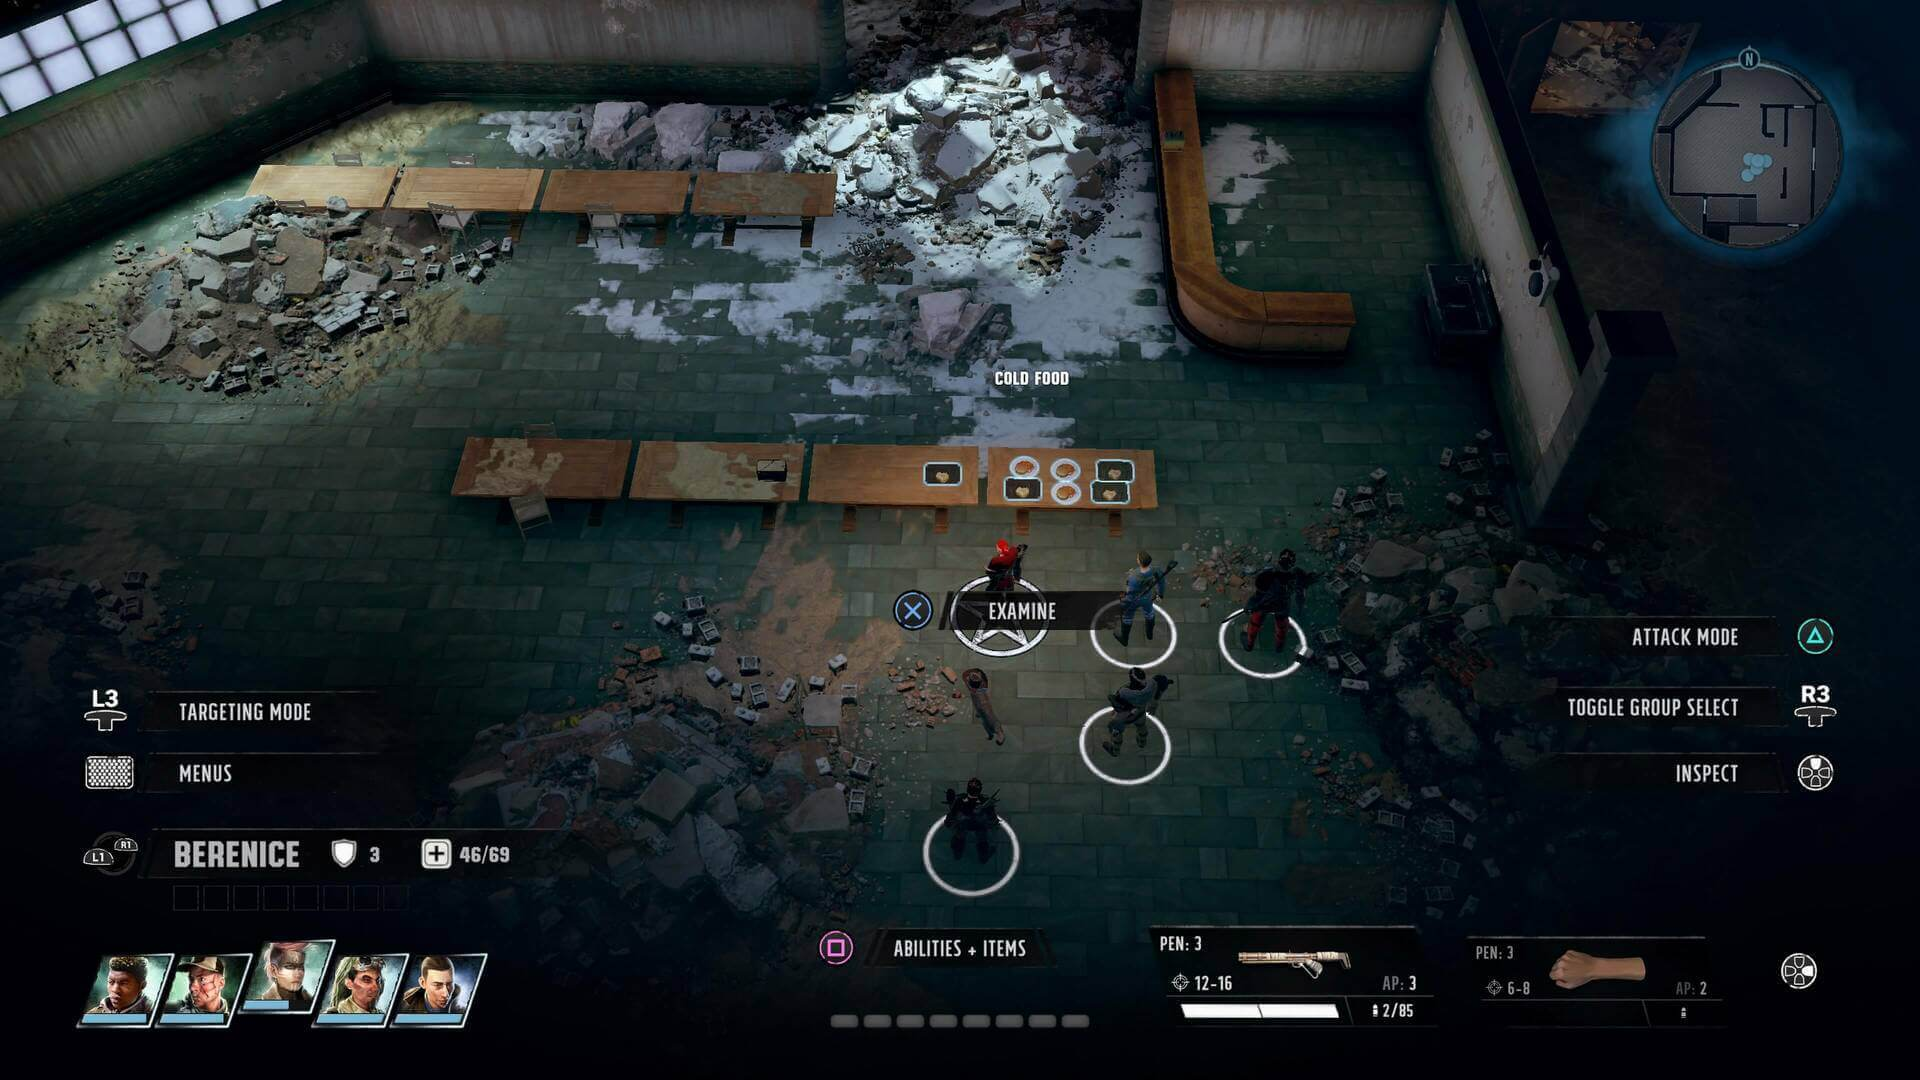 Wasteland, RPG, CRPG, inXile, Deep Silver, Brian Fargo, Rangers, Delfos